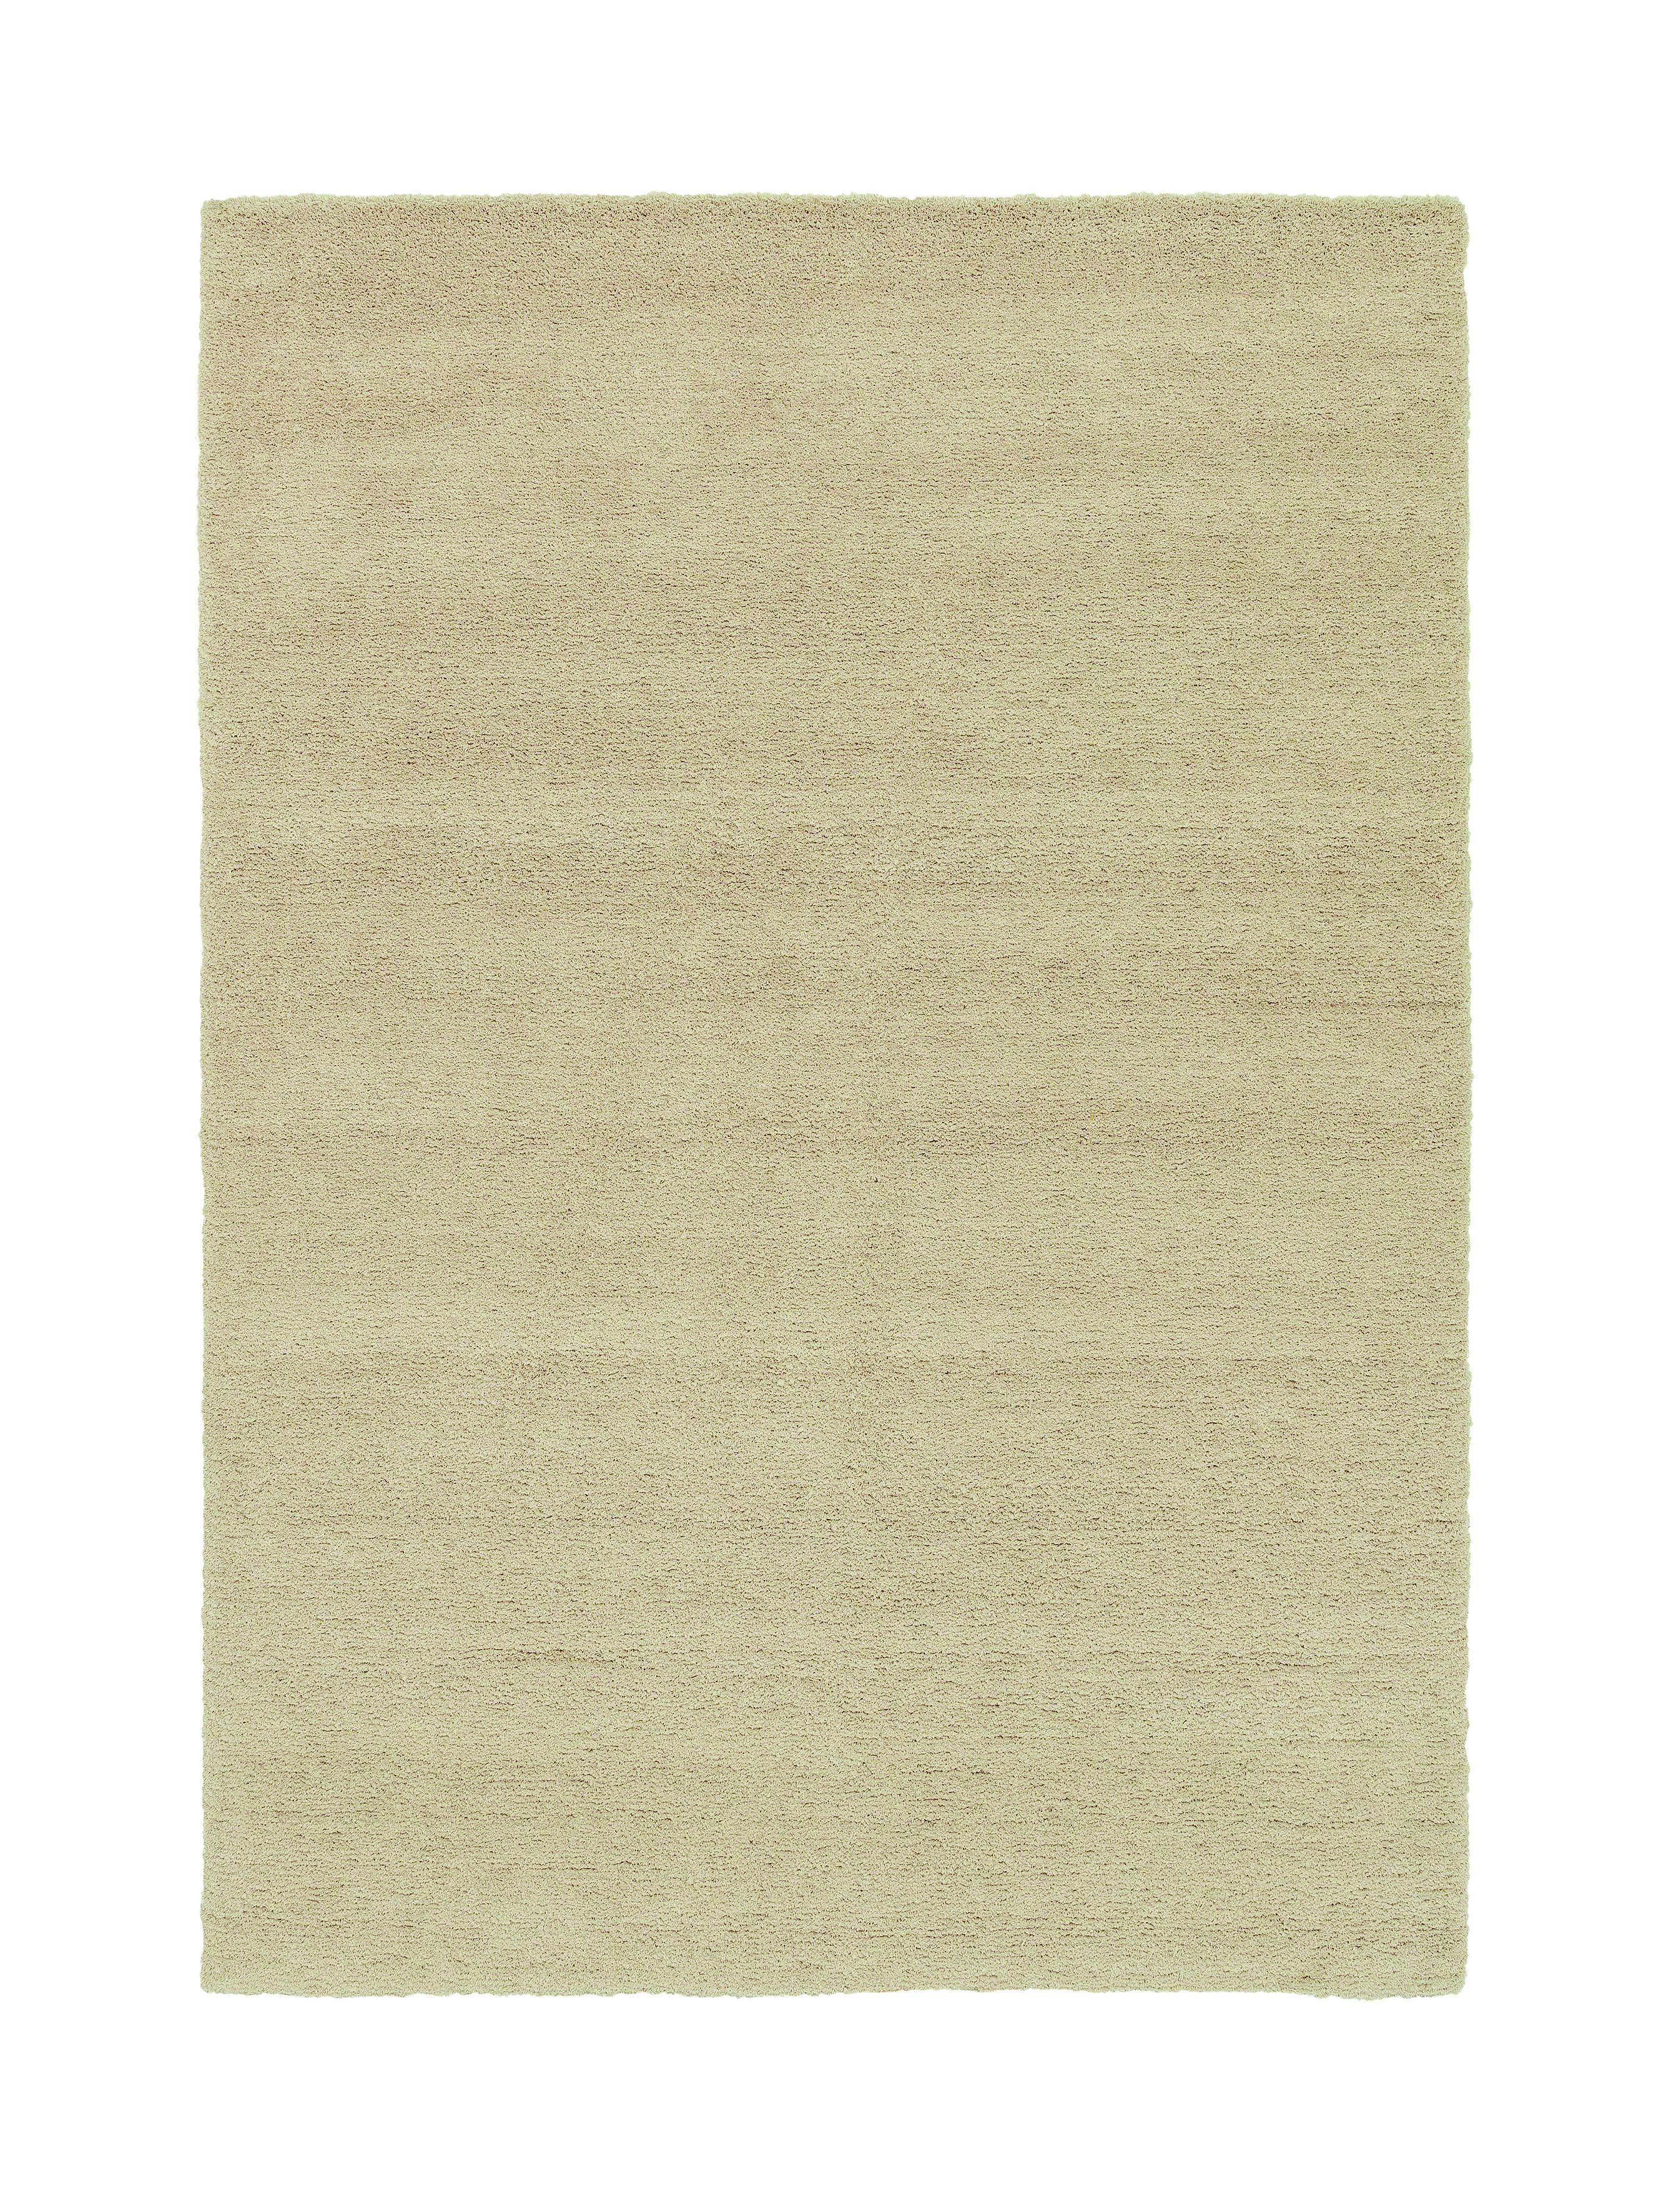 Astra - Golze koberce Kusový koberec Livorno 007 Beige - 120x180 cm